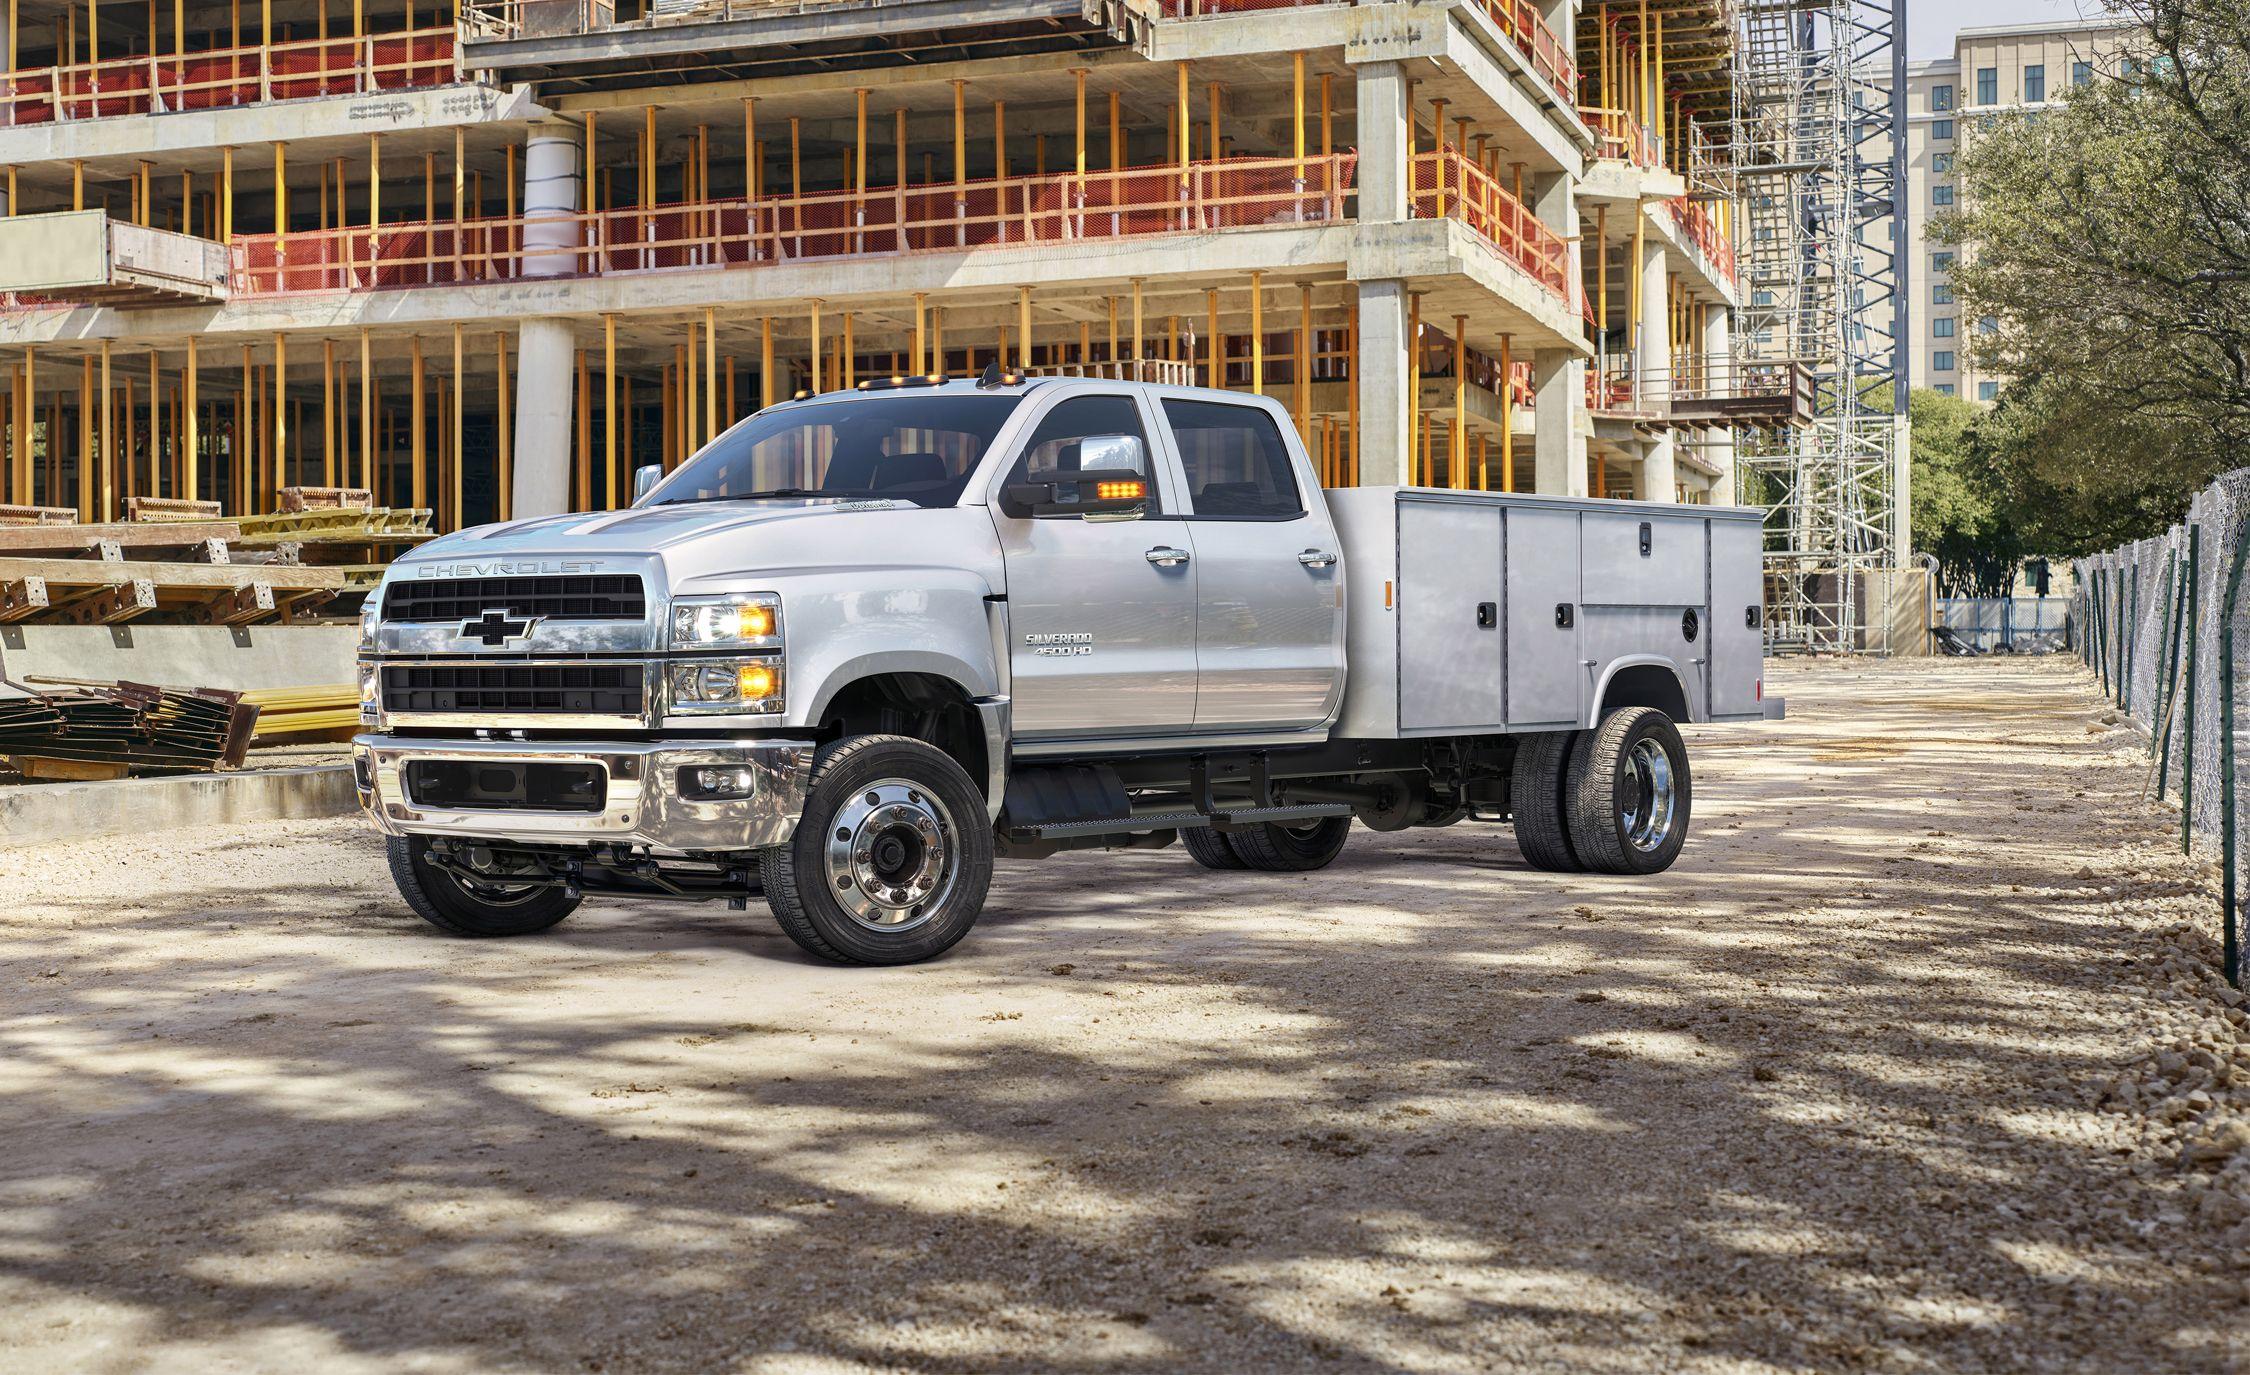 2019 Chevrolet Silverado 4500hd 5500hd 6500hd Chis Cab Flexin